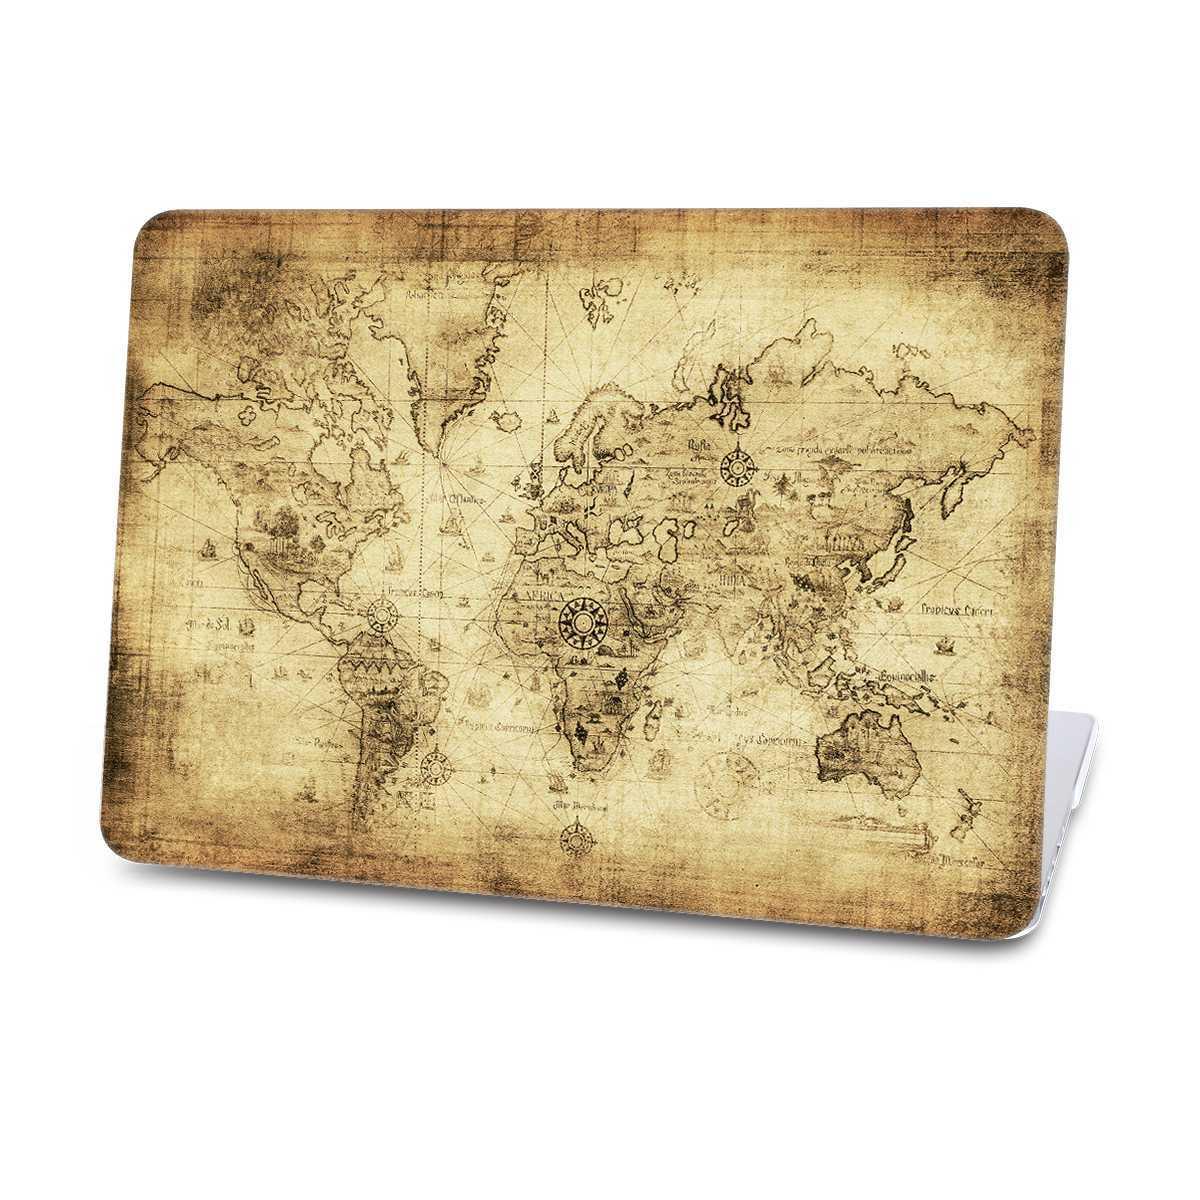 Worldmap macbook case mbb04 2399 macbook case and decals worldmap macbook case gumiabroncs Choice Image